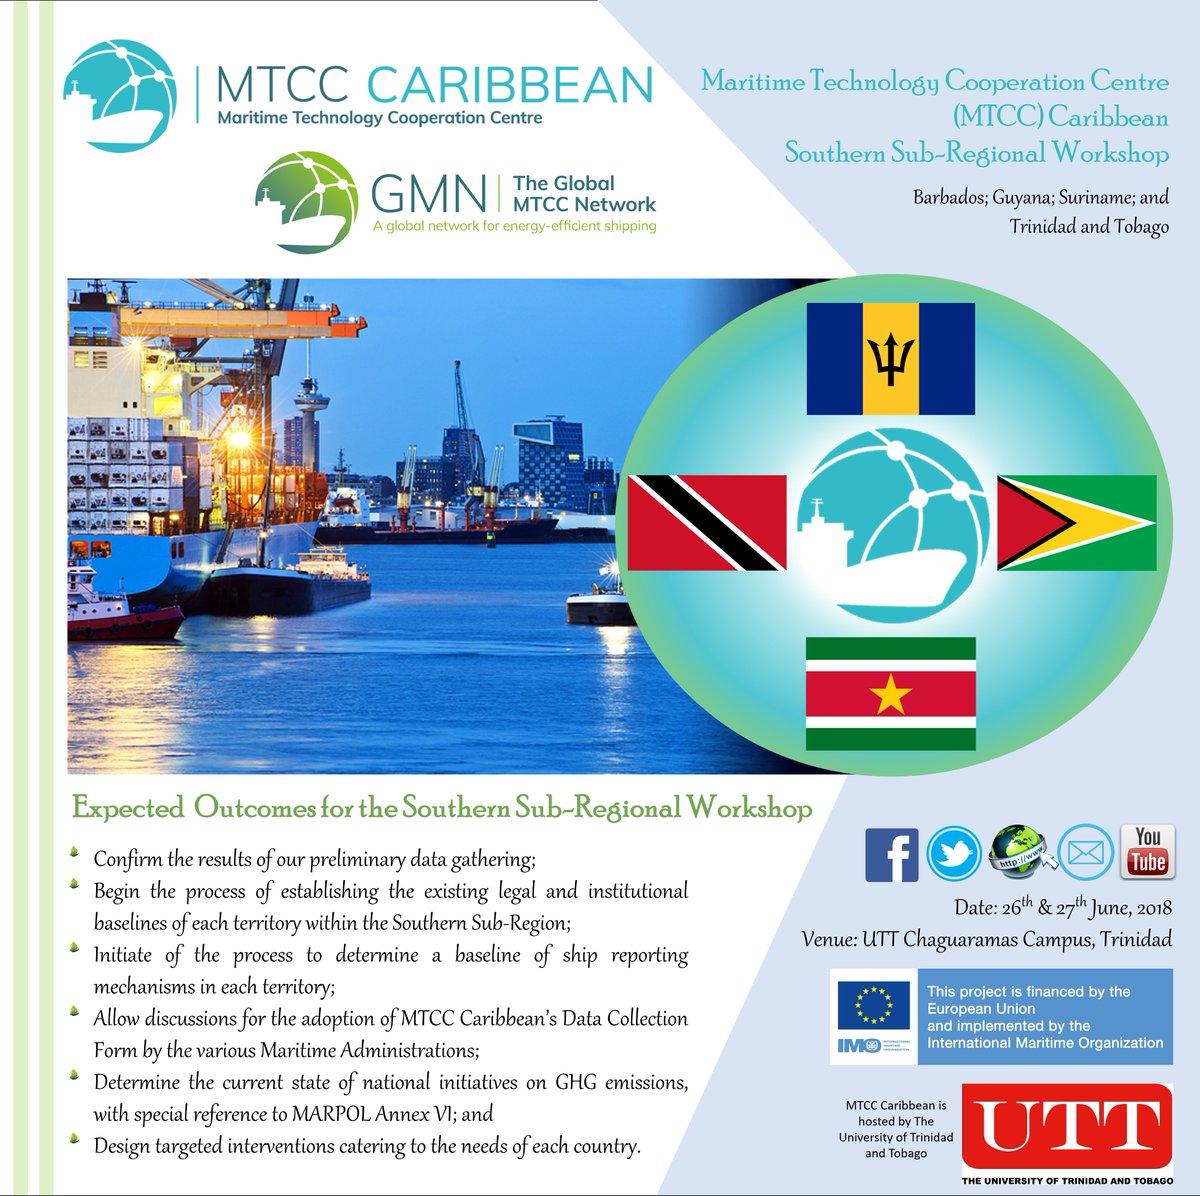 MTCC Caribbean on Twitter: